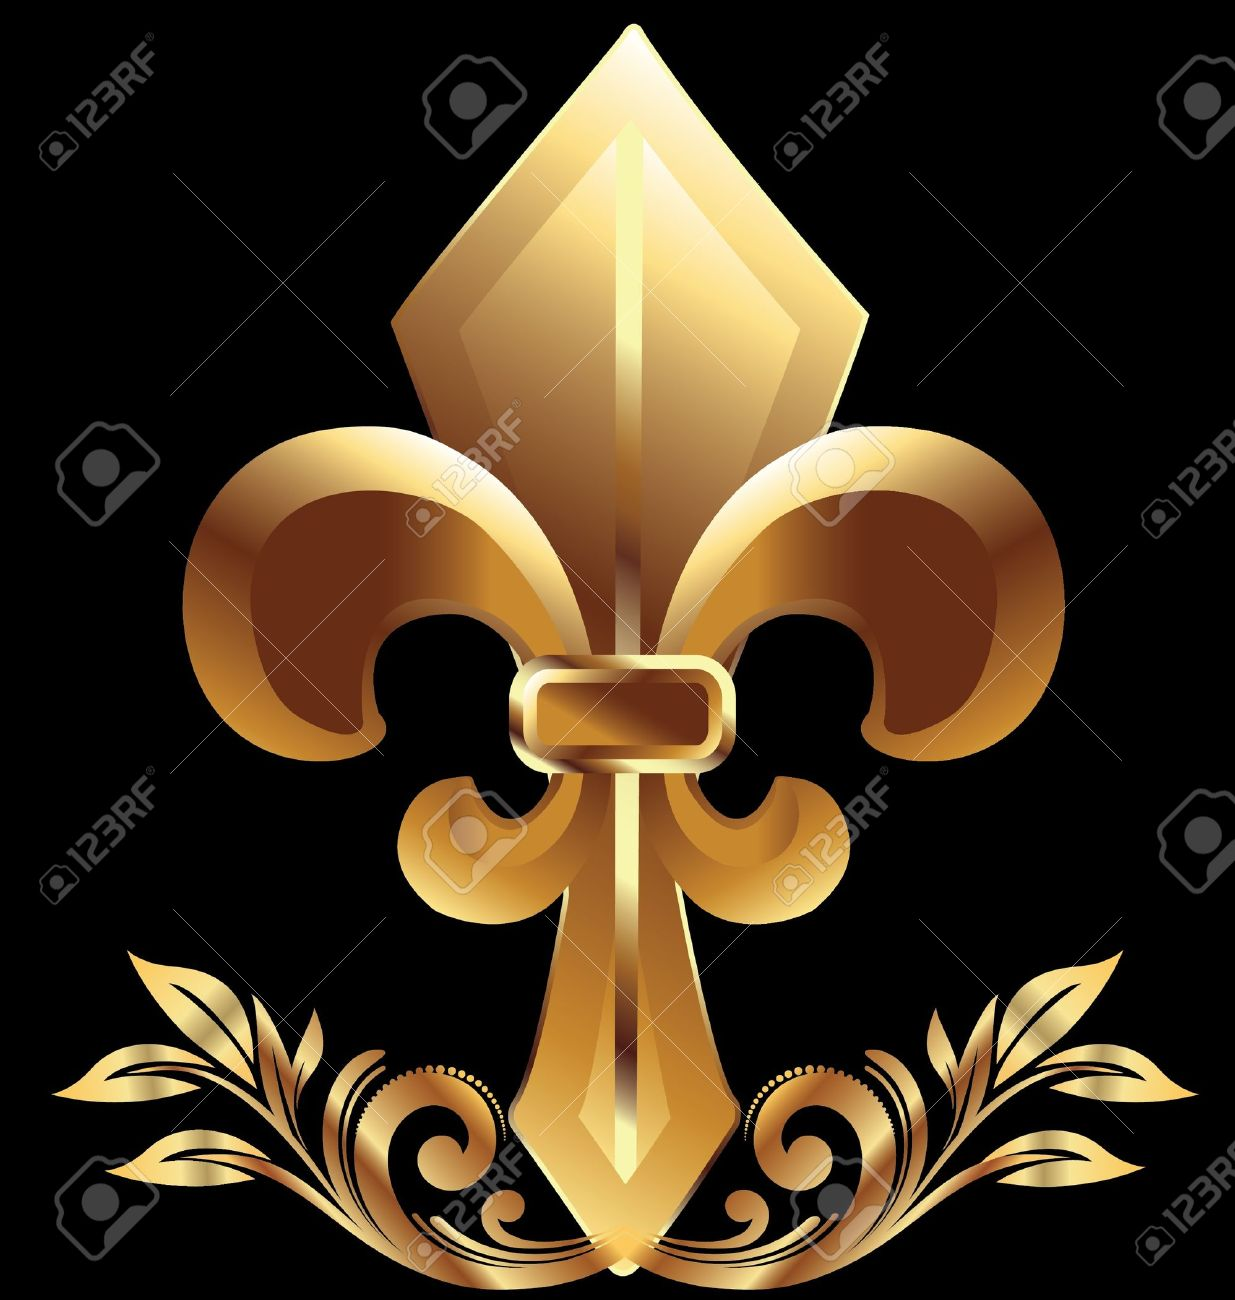 Golden fleur de liz symbol royalty free cliparts vectors and golden fleur de liz symbol stock vector 17810420 biocorpaavc